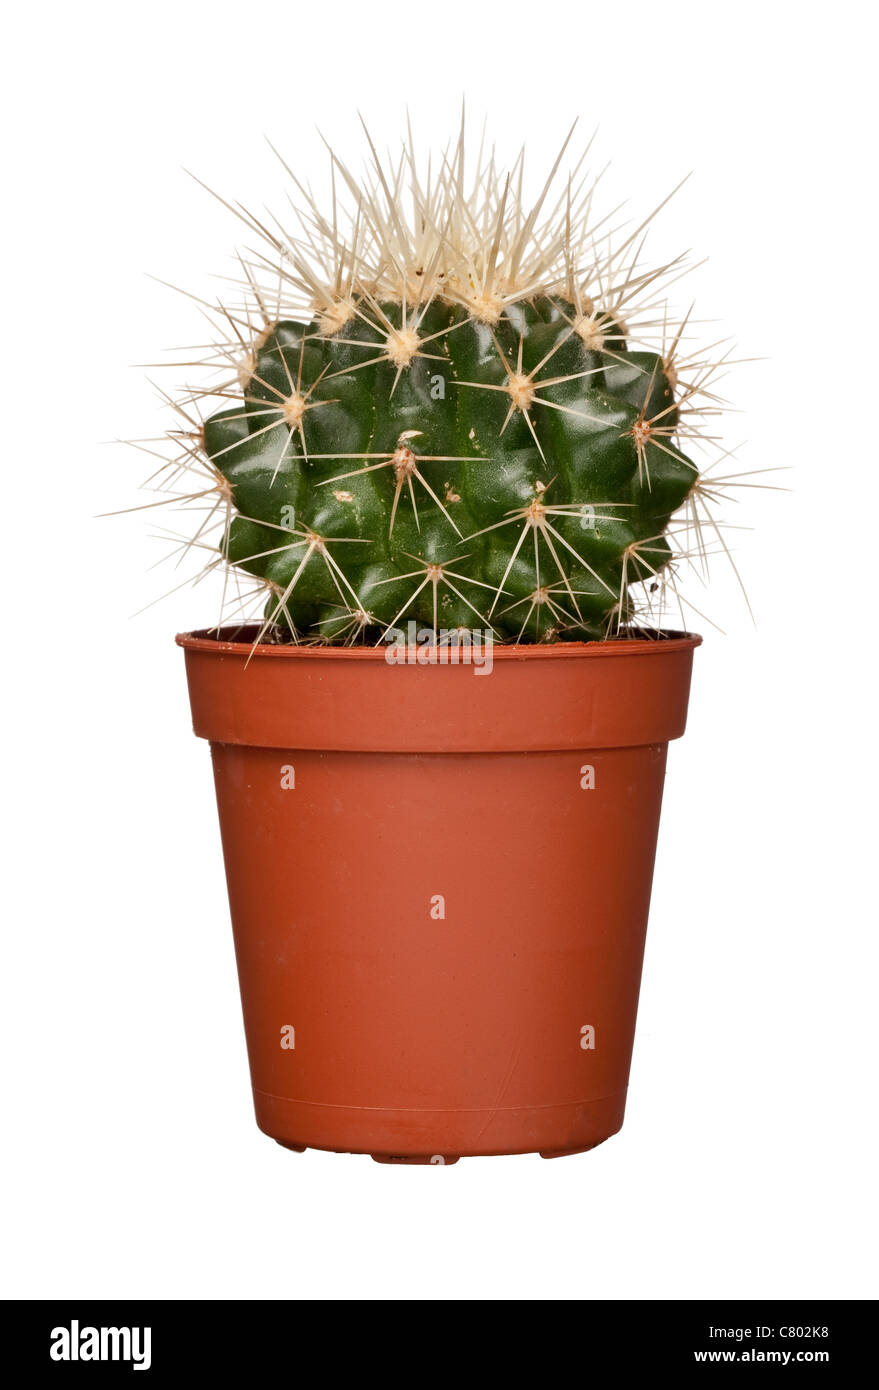 Cactus, studio shot - Stock Image